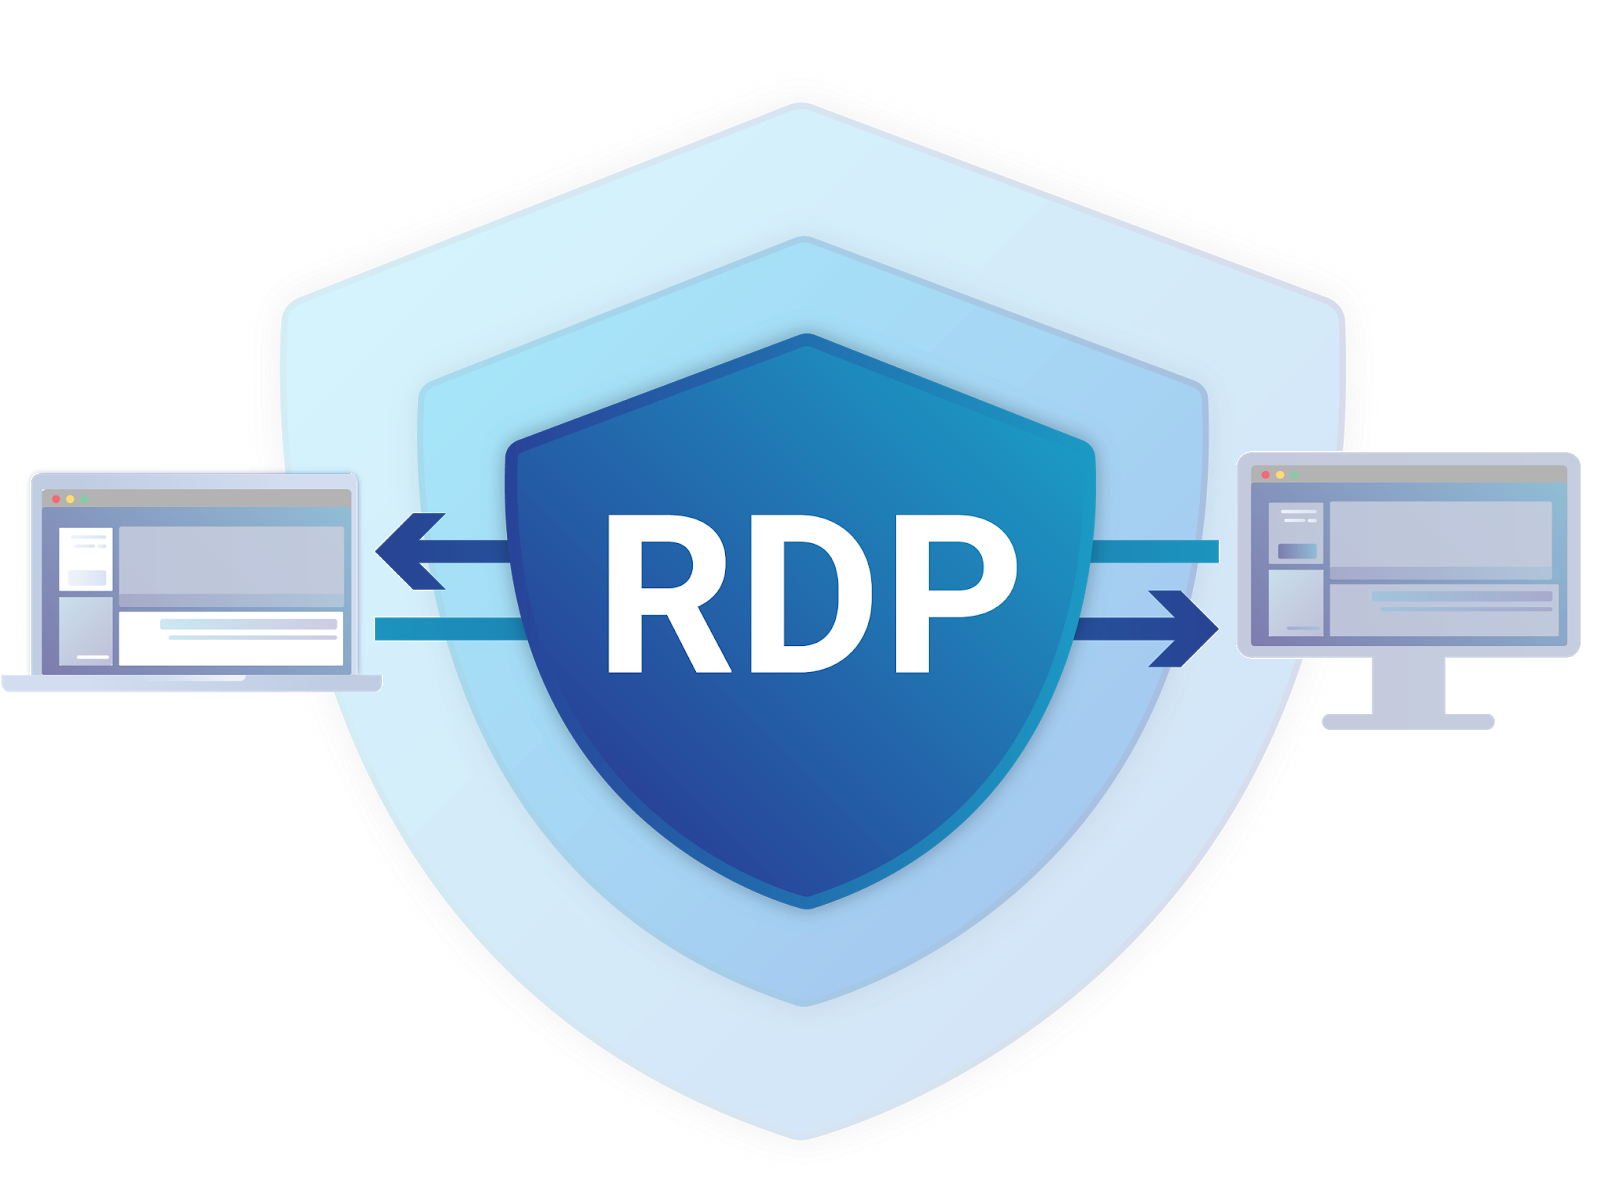 rdp port,rdp free,rdp windows,rdp free trial,rdp clutch,rdp server,rdp مجاني windows,rdp99,rdp شرح,قيح يخرج من الاذن,قيح يخرج من الاذن في المنام,rdp win 10,rdp i windows 7,y&r spoilers,rdp ويكيبيديا,rdp وهمي,rdp ويندوز,rdp ويندوز سيرفر,ردب وتدي غربالي,وظيفة rdp,ويندوز rdp,ما هو rdp وكيف يمكن الحصول عليه مجانا على الويندوز,rdp هو,rdp hp,rdp ما هو,rdp h.264,rdp h.265,rdp hp thin client,rdp h,rdp hp universal print driver,hp rdp,hp rdp thin client,hp rdp usb redirector client,hp rdp supported printers,hp rdp usb redirector,hp rdp multimedia & usb enhancement software,hp rdp compatible printers,hp rdp client,نظام rdp,نقل rdp,نصب rdp در لینوکس,ناراسیما ردب,rdp نرم افزار,نصب rdp,nrdp,ln-rdp,rdp ماهو,rdp مجاني لمدة شهر,rdp مجاني مدى الحياة,rdp مجاني مدى الحياة بسرعة أنترنت عالية جدا,rdp مجاني windows 2021,rdp مدى الحياة,rdp مجاني للاندرويد,m rdp,m dps,rdpvo m-v,rdprm,rdp bk-m,rdp للبيع,rdp للهاتف,rdp للاندرويد,rdp للتعدين,rdp للايفون,rdp لمدة سنة,rdp لمدة شهر,rdp لتشغيل الالعاب,l'rdp,le rdpc,le rdpc au cameroun,le rdpd,le rdpg,rdp l'accès à la session requis est refusé,ردب كبدي كلوي,كلتش rdp,كويك rdp,كلج rdp,rdp c,كلين ردب,كلمة ردي,معنى كلمة rdp,قائمة rdp,قیمت درب,قيح في الحلق,قيح في البول,قيح في اللثة,قيح في الاصبع,قيح في اصبع القدم,قيح في فروة الراس,قيح في العين,قيح في الاذن,ff rdps,rdp 1 on-f,rdp f keys,rdp /f,rdp f tasten,قيح على اللوزتين,uae rdp,erdp electronic recreational dive planner,erdpml,rdpr e swathu,rdp طريقة,رجب طيب أردوغان,قيح ضرس العقل,rdp بصلاحية,صنع rdp,صلاحيات rdp,كيفية صنع rdp,طريقة صنع rdp,rdp شراء,rdp شرح الحصول على,rdp شرح برنامج,rdp شغال,ردب شطرنج,شراء rdp بفيزا,شراء rdp من امازون,ssh rdp,ssh rdp tunnel,ssh rdp client,ssh rdp manager,ssh rdp vnc,ssh rdp tunnel plink,rdp.sh,rdp.sh discord,what is rdp,rdp s.r.o,rdpark s.r.o,rdp s pen,قيح زوجها,rdp z wiersza poleceń,rdp رخيص,رغدي rdp,رمز rdp,شراء rdp رخيص,امين رغيب rdp,rdpr,rdp r&d,رزین rdp,r rdplot,r rdpack,ddply in r,r dplyr,r rpdr,er rdp,rdpack r package,قيح داخل الاذن,قيح داخل الفم,قيح داخل الانف,ق